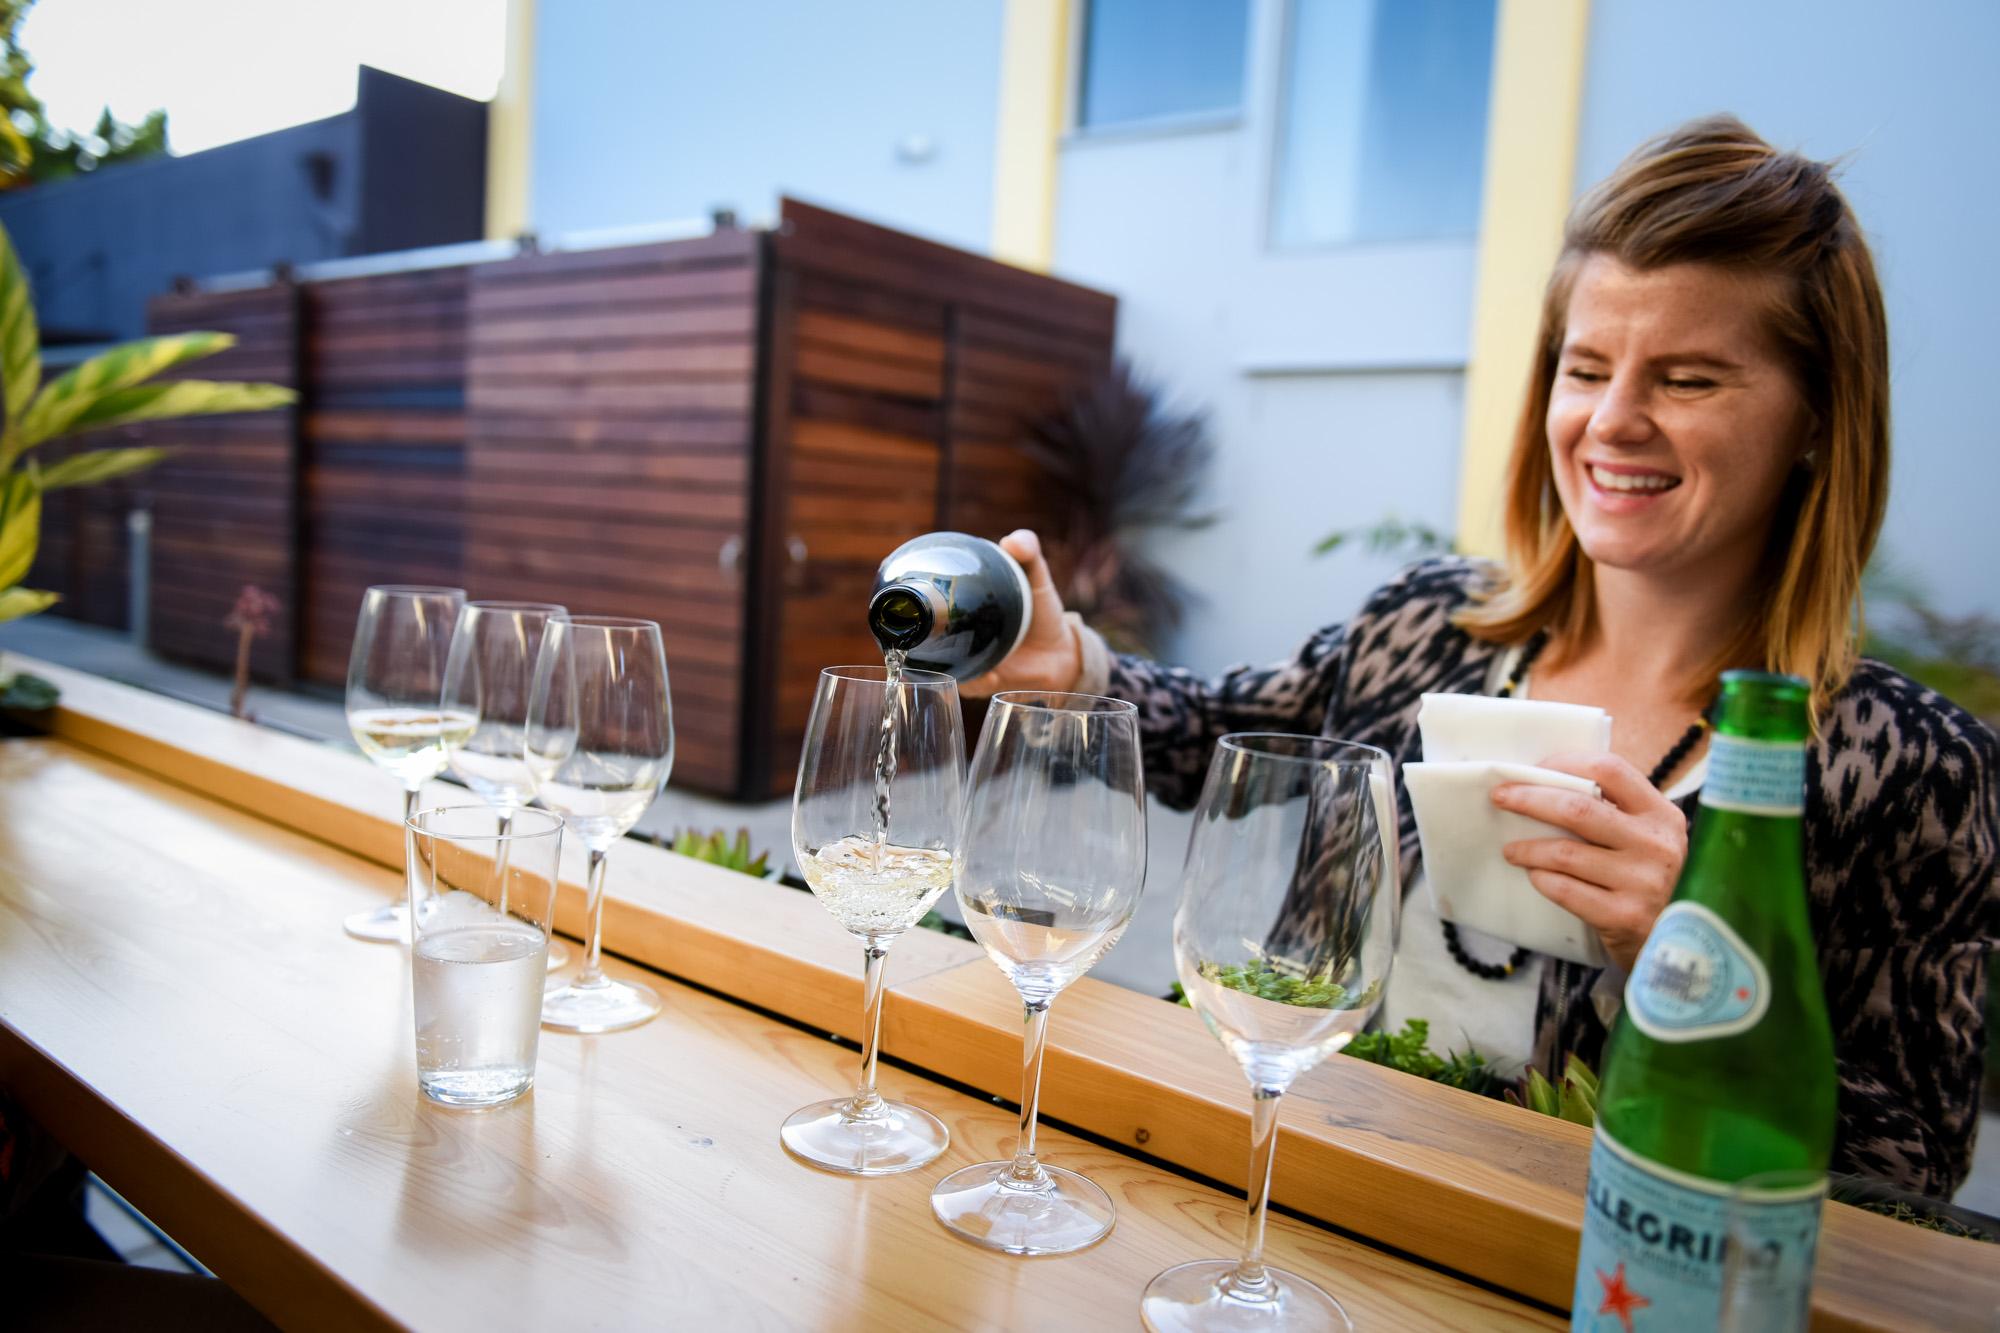 Llamas Family Wine Tasting | Cadet Beer + Wine Bar, Napa, California